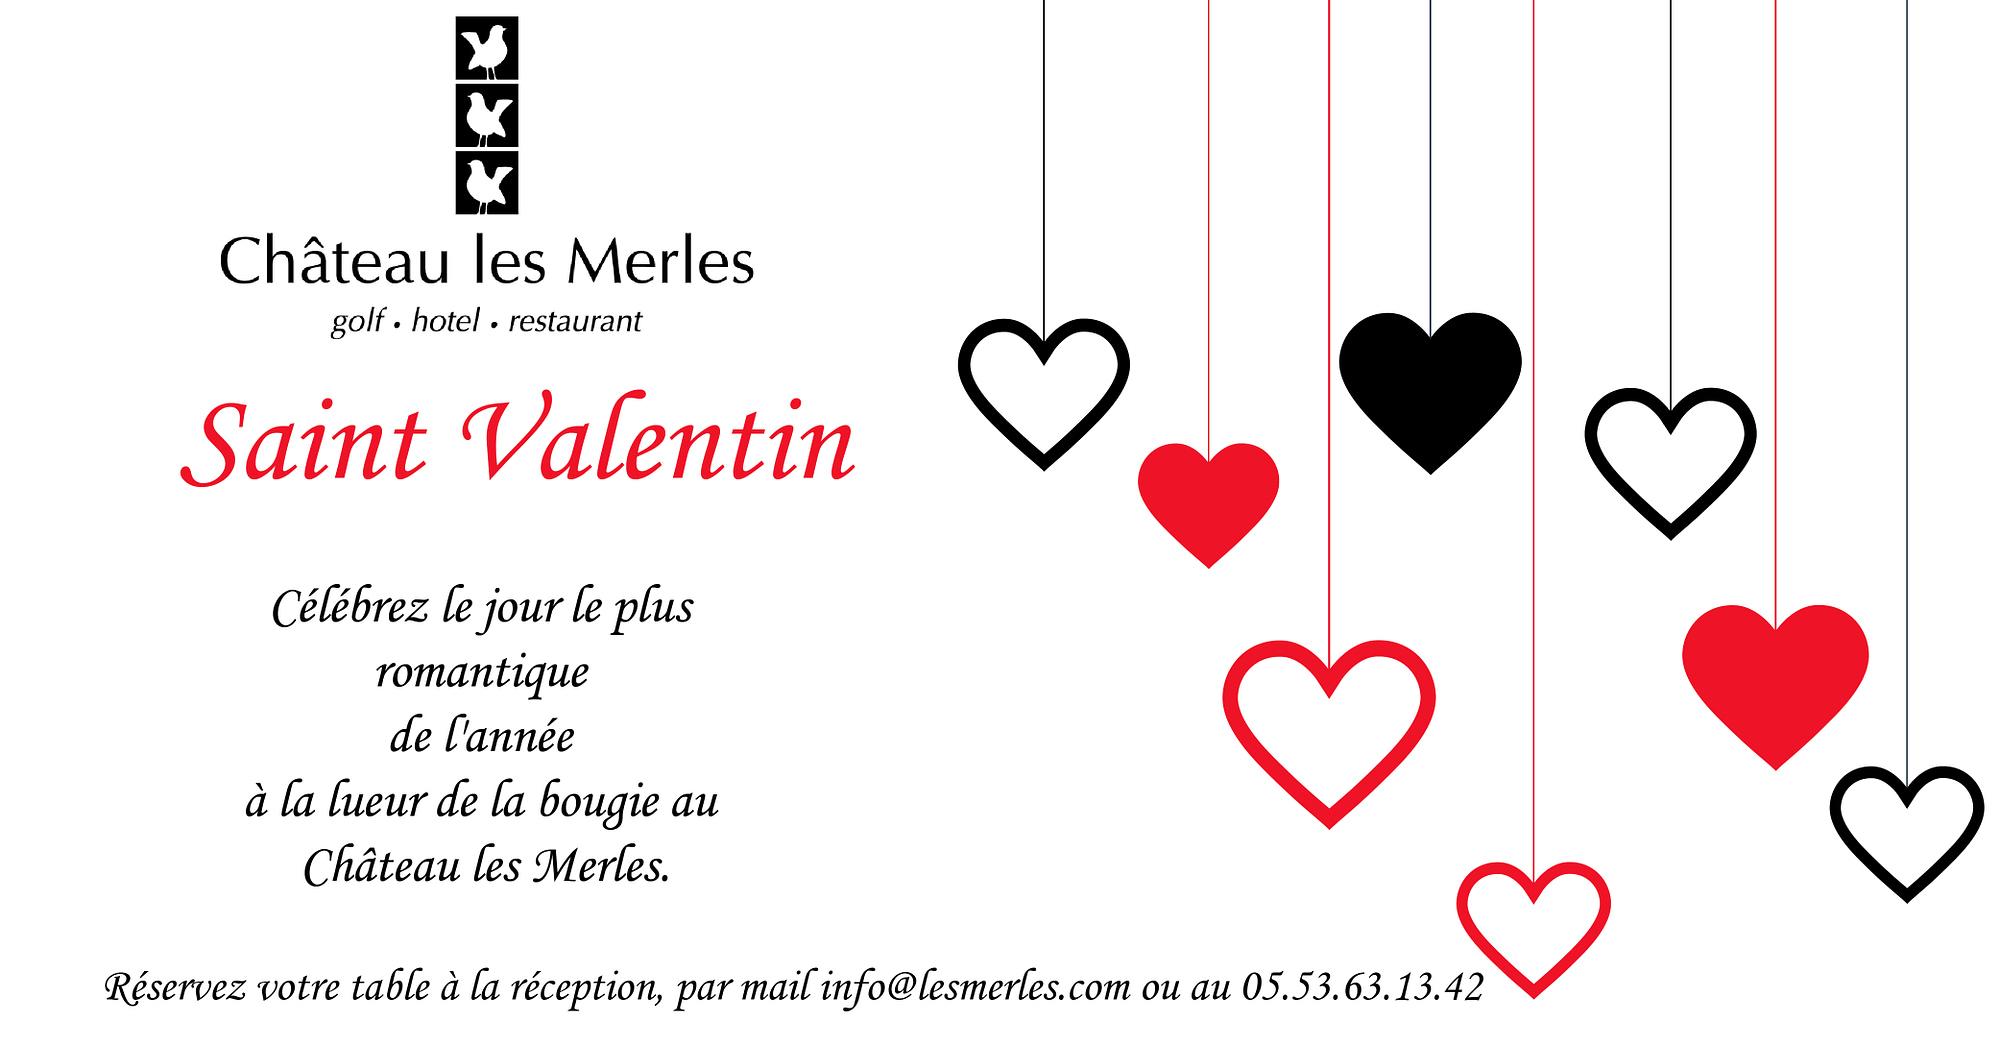 Séjour Saint Valentin